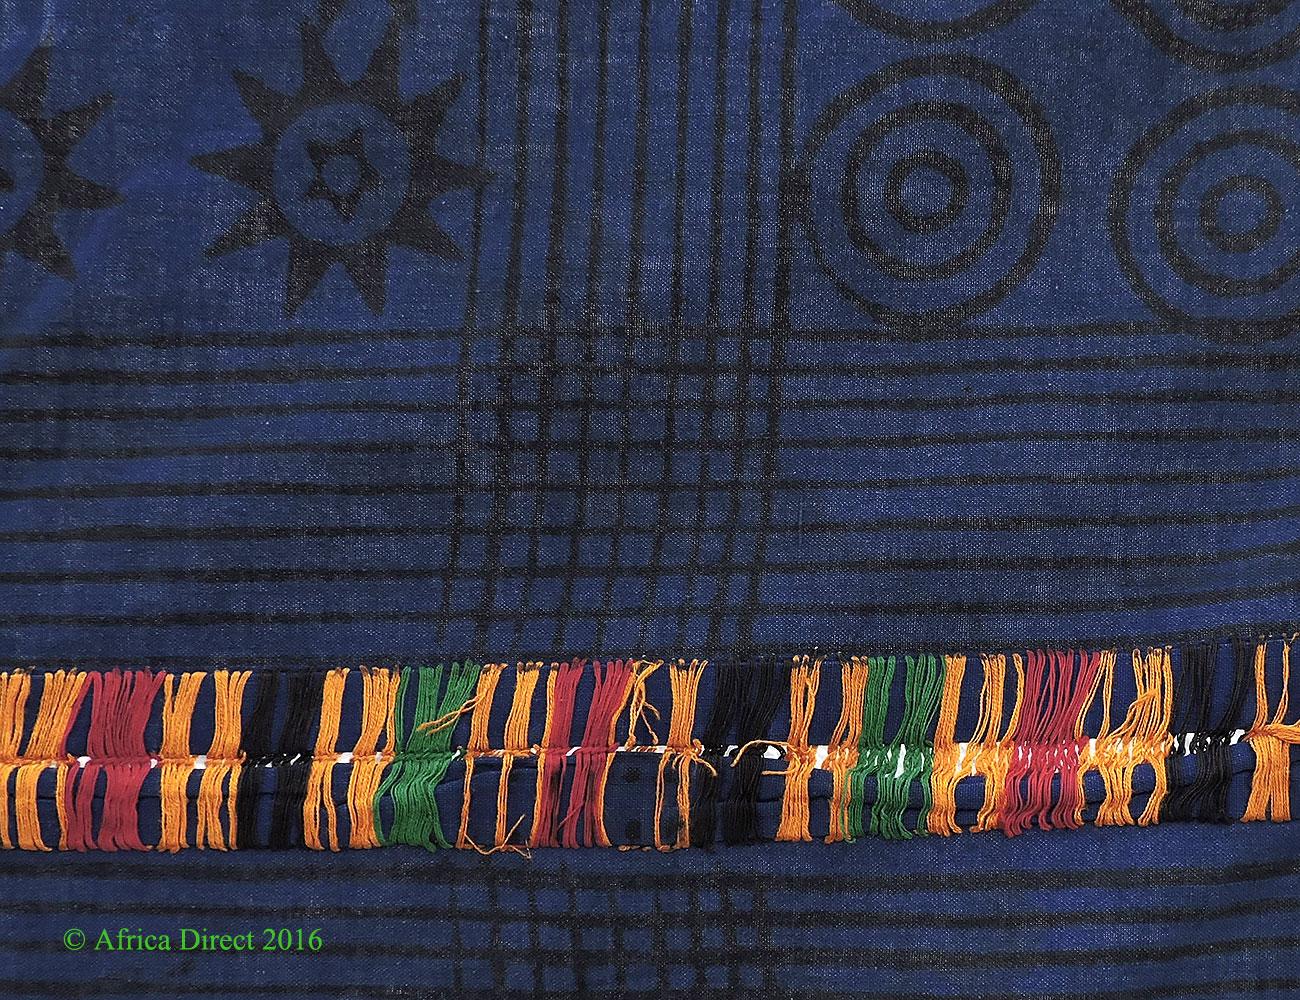 adinkra stamped cloth blue asante ghana 10x7 feet african african